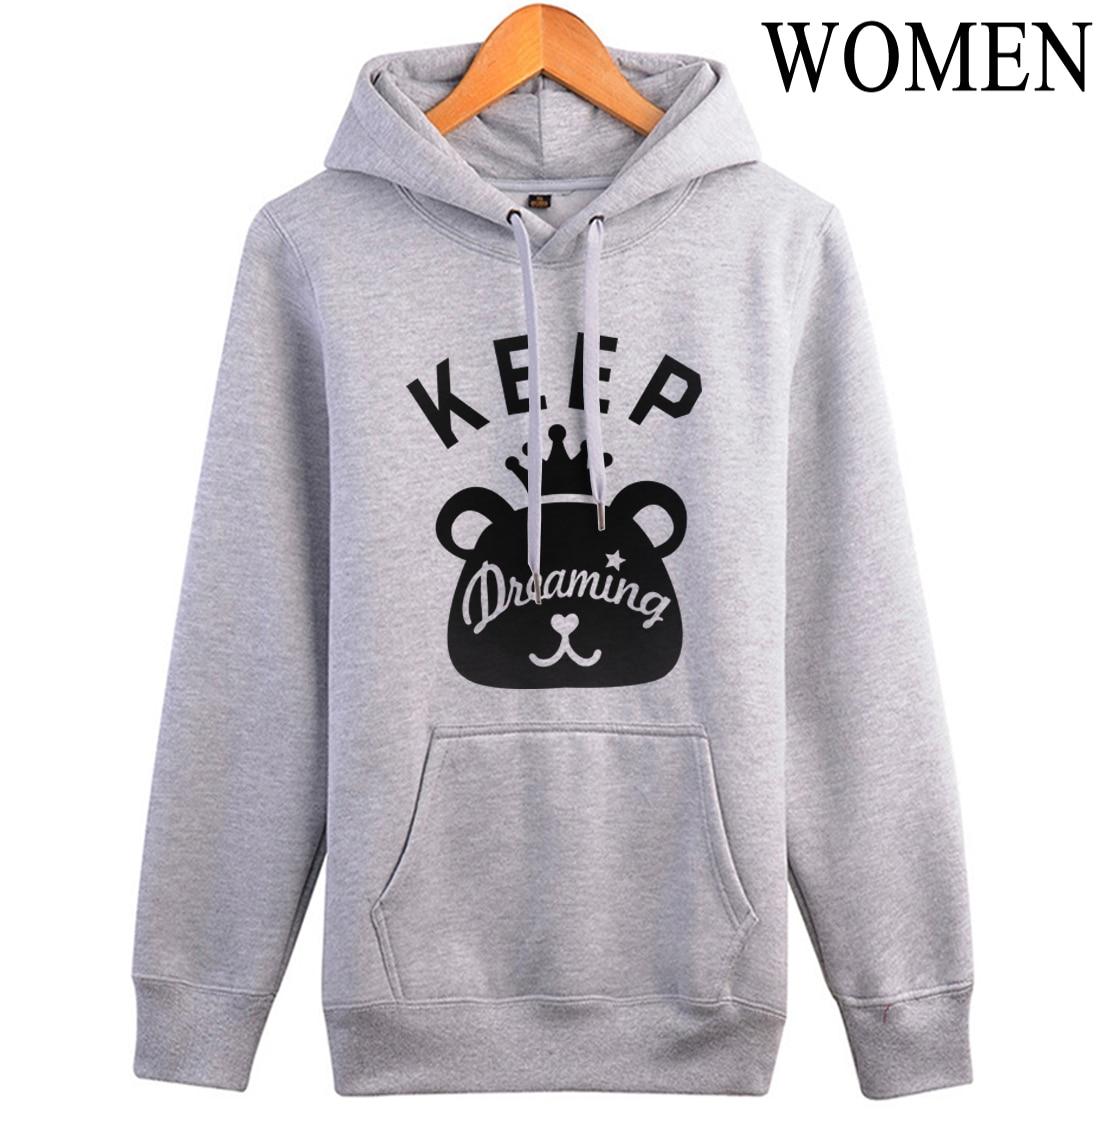 2019 autumn fashion long sleeve brand clothing Keep Dreaming kawaii Cartoon tracksuits women sweatshirts fitness fleece hoodies